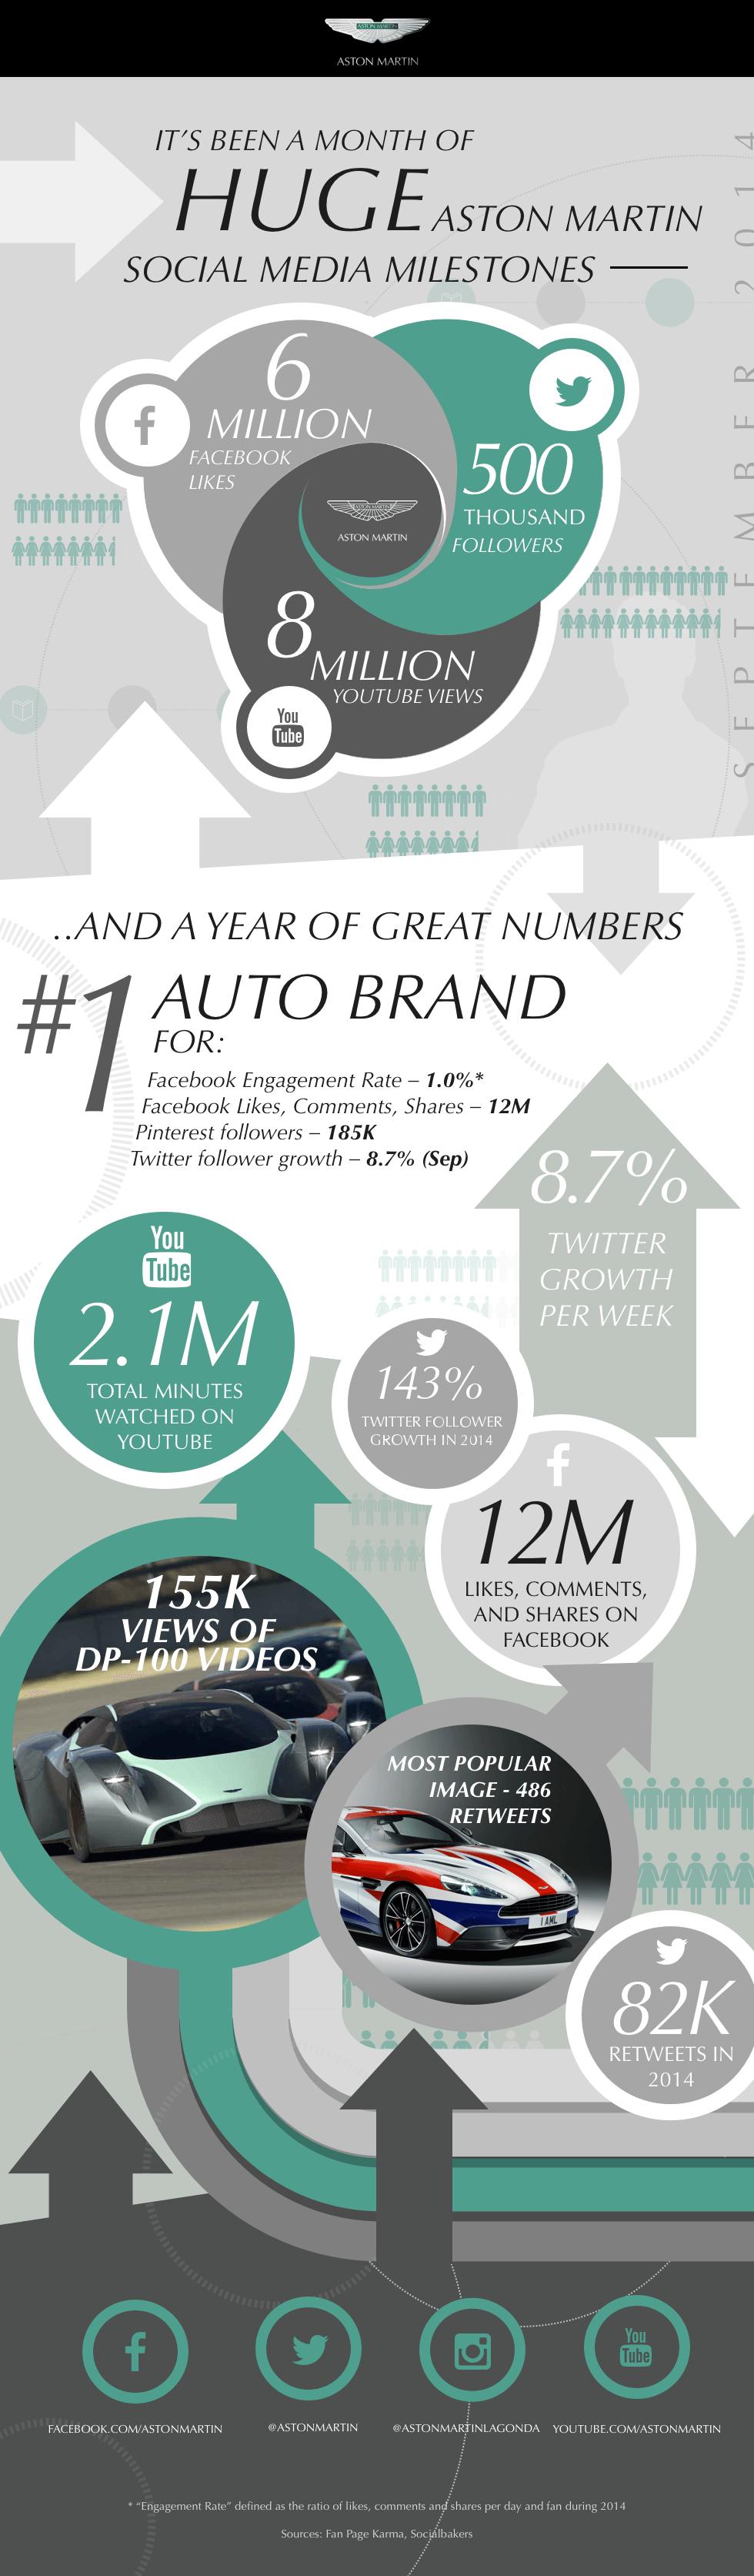 aston martin social media - a month of milestones